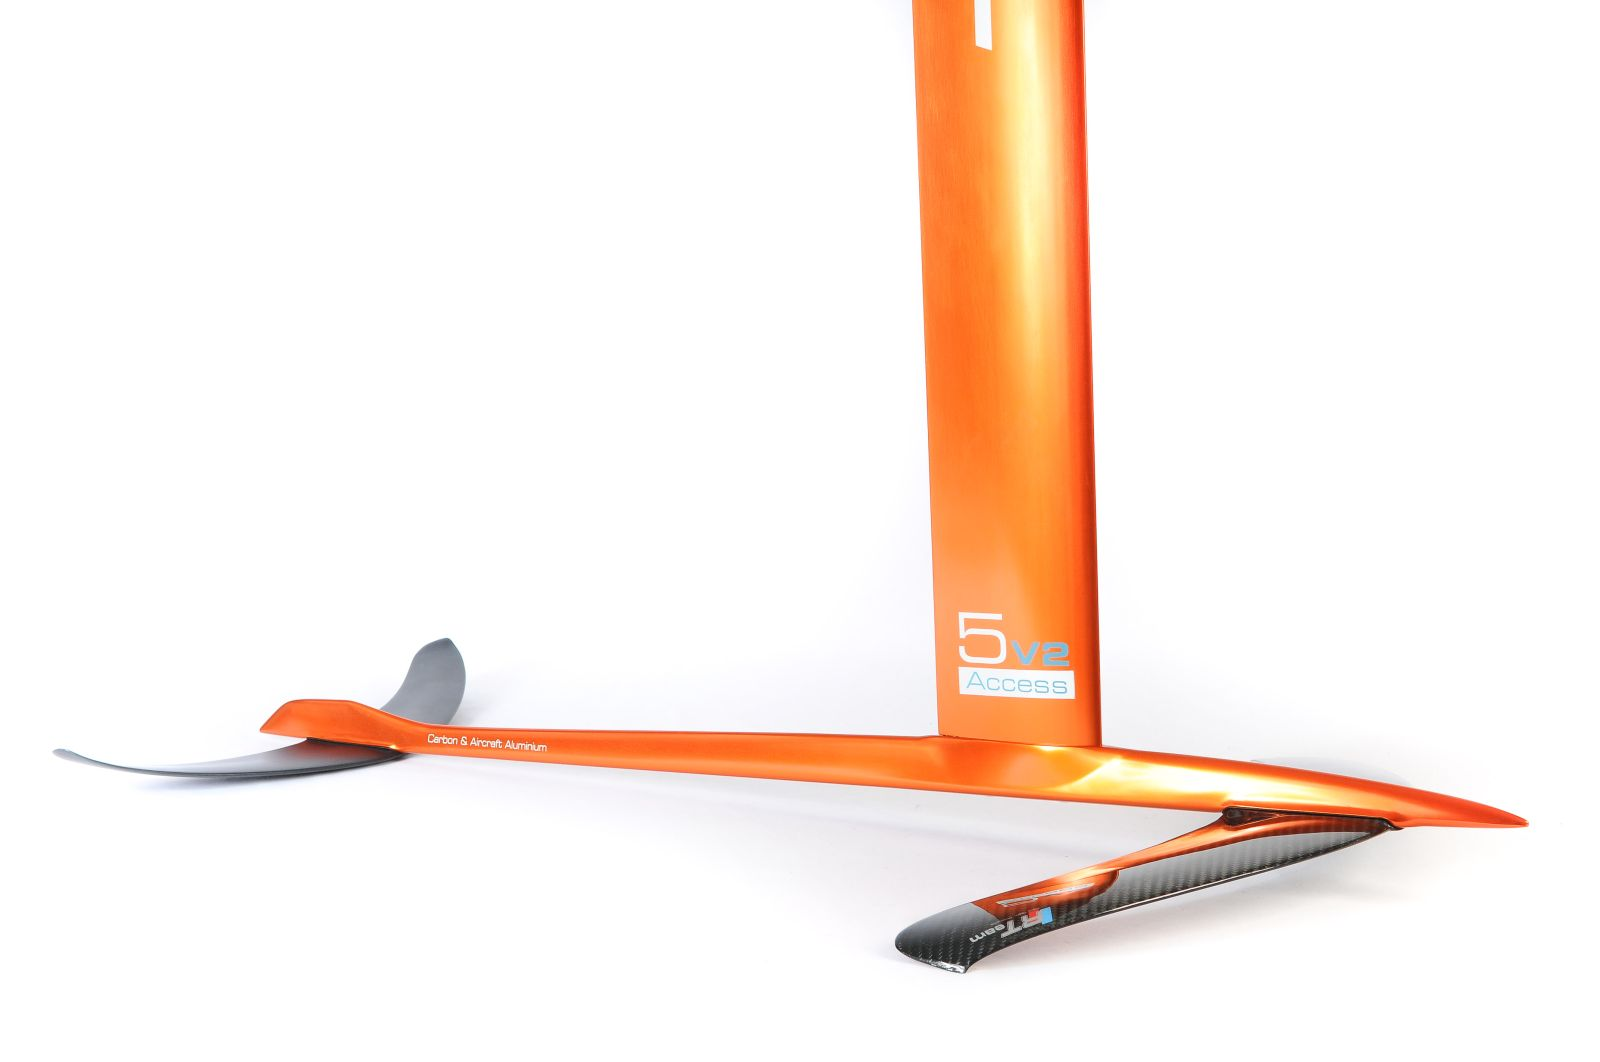 Kitefoil carbon aluminium alpinefoil 5 0 access v2 2514 1